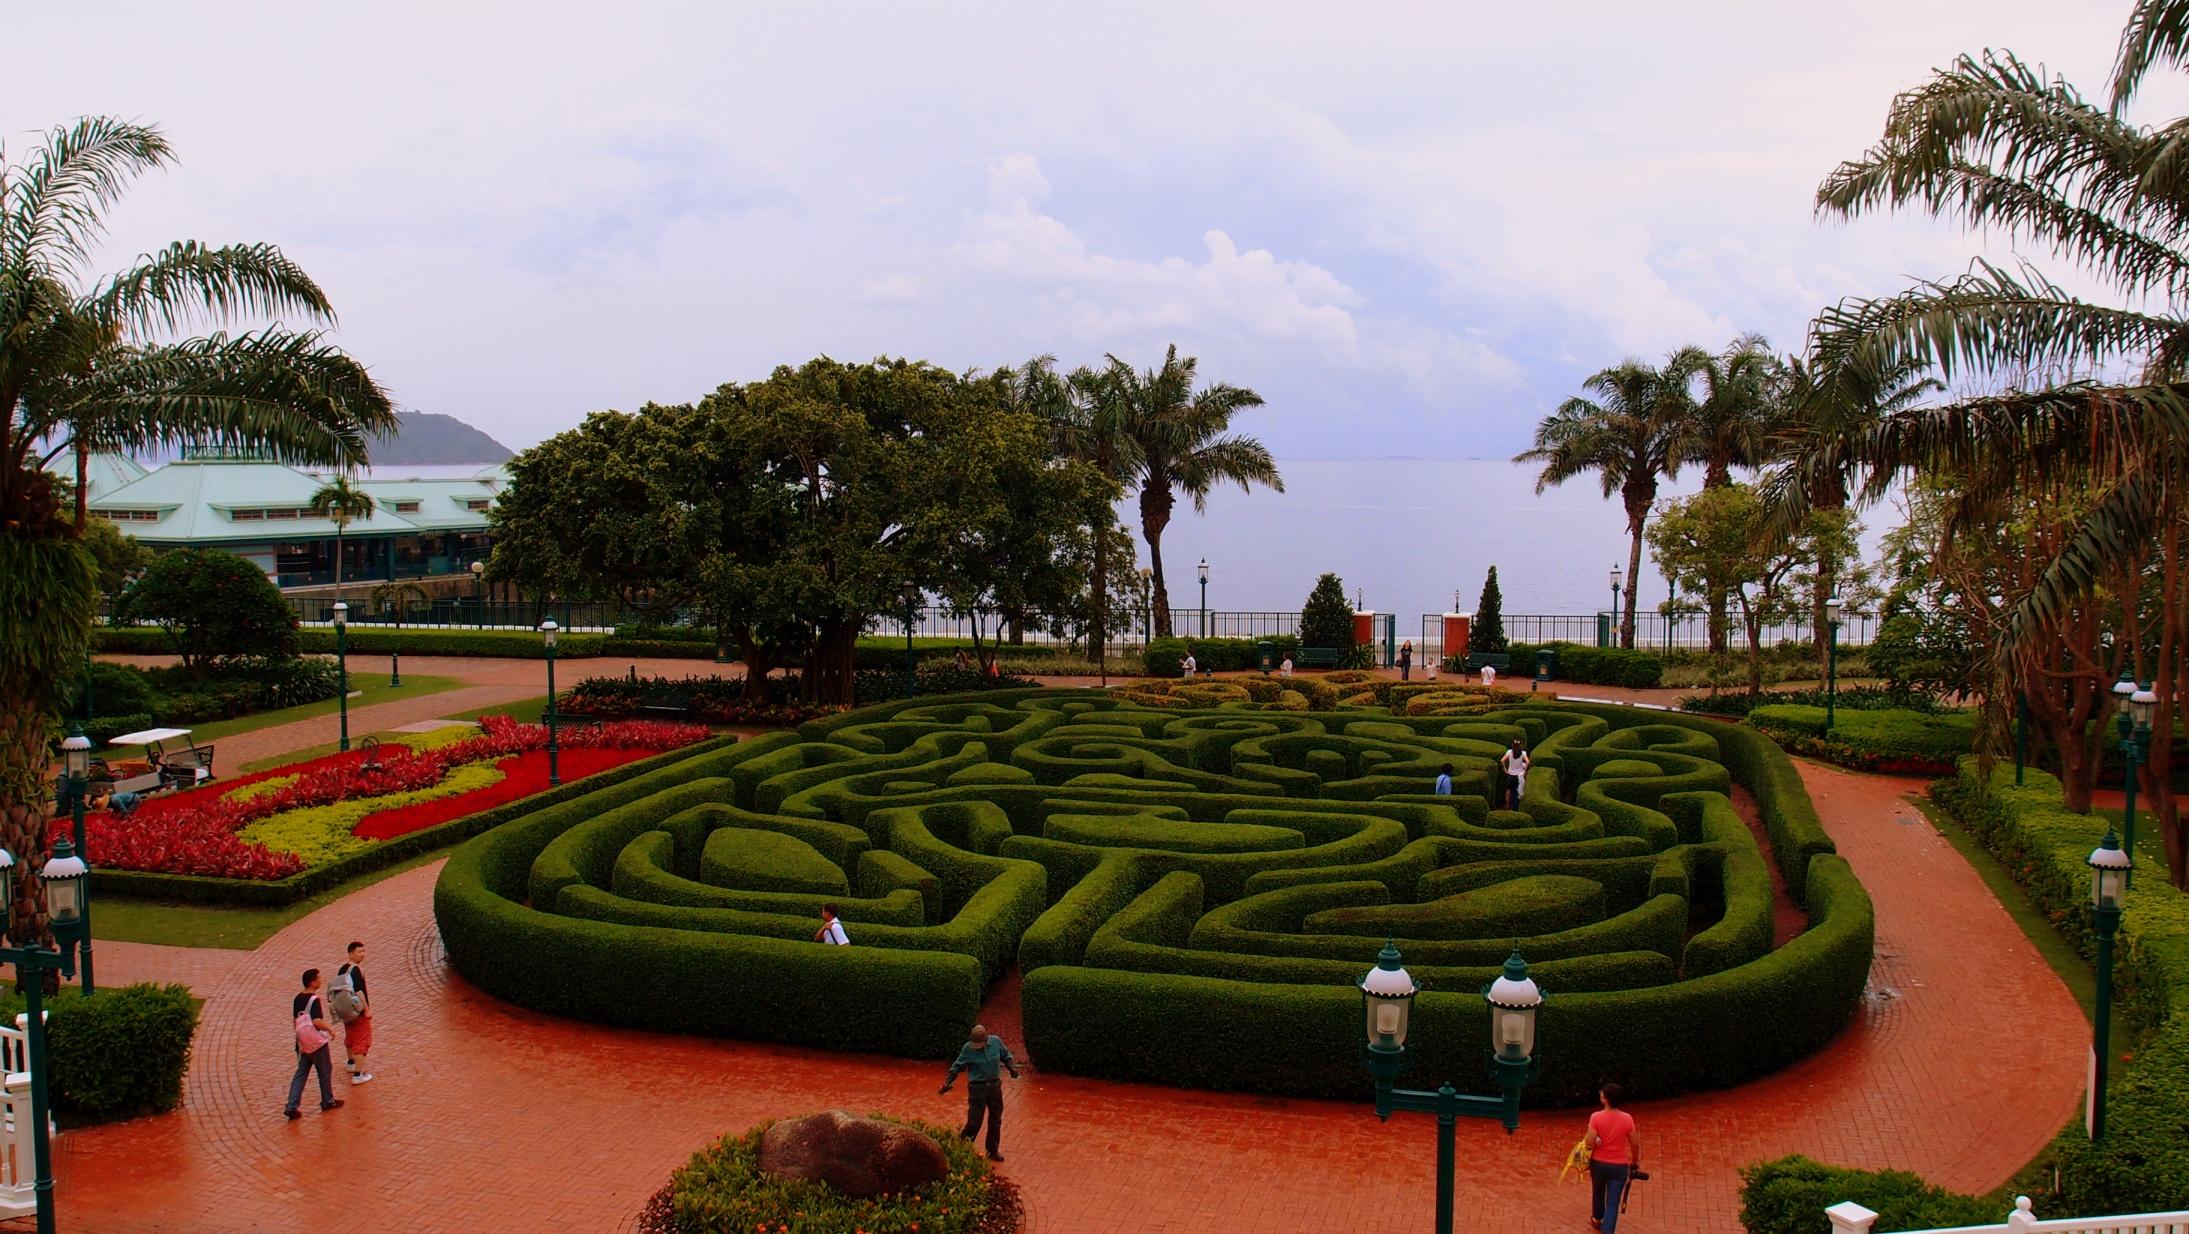 The Disneyland Maze